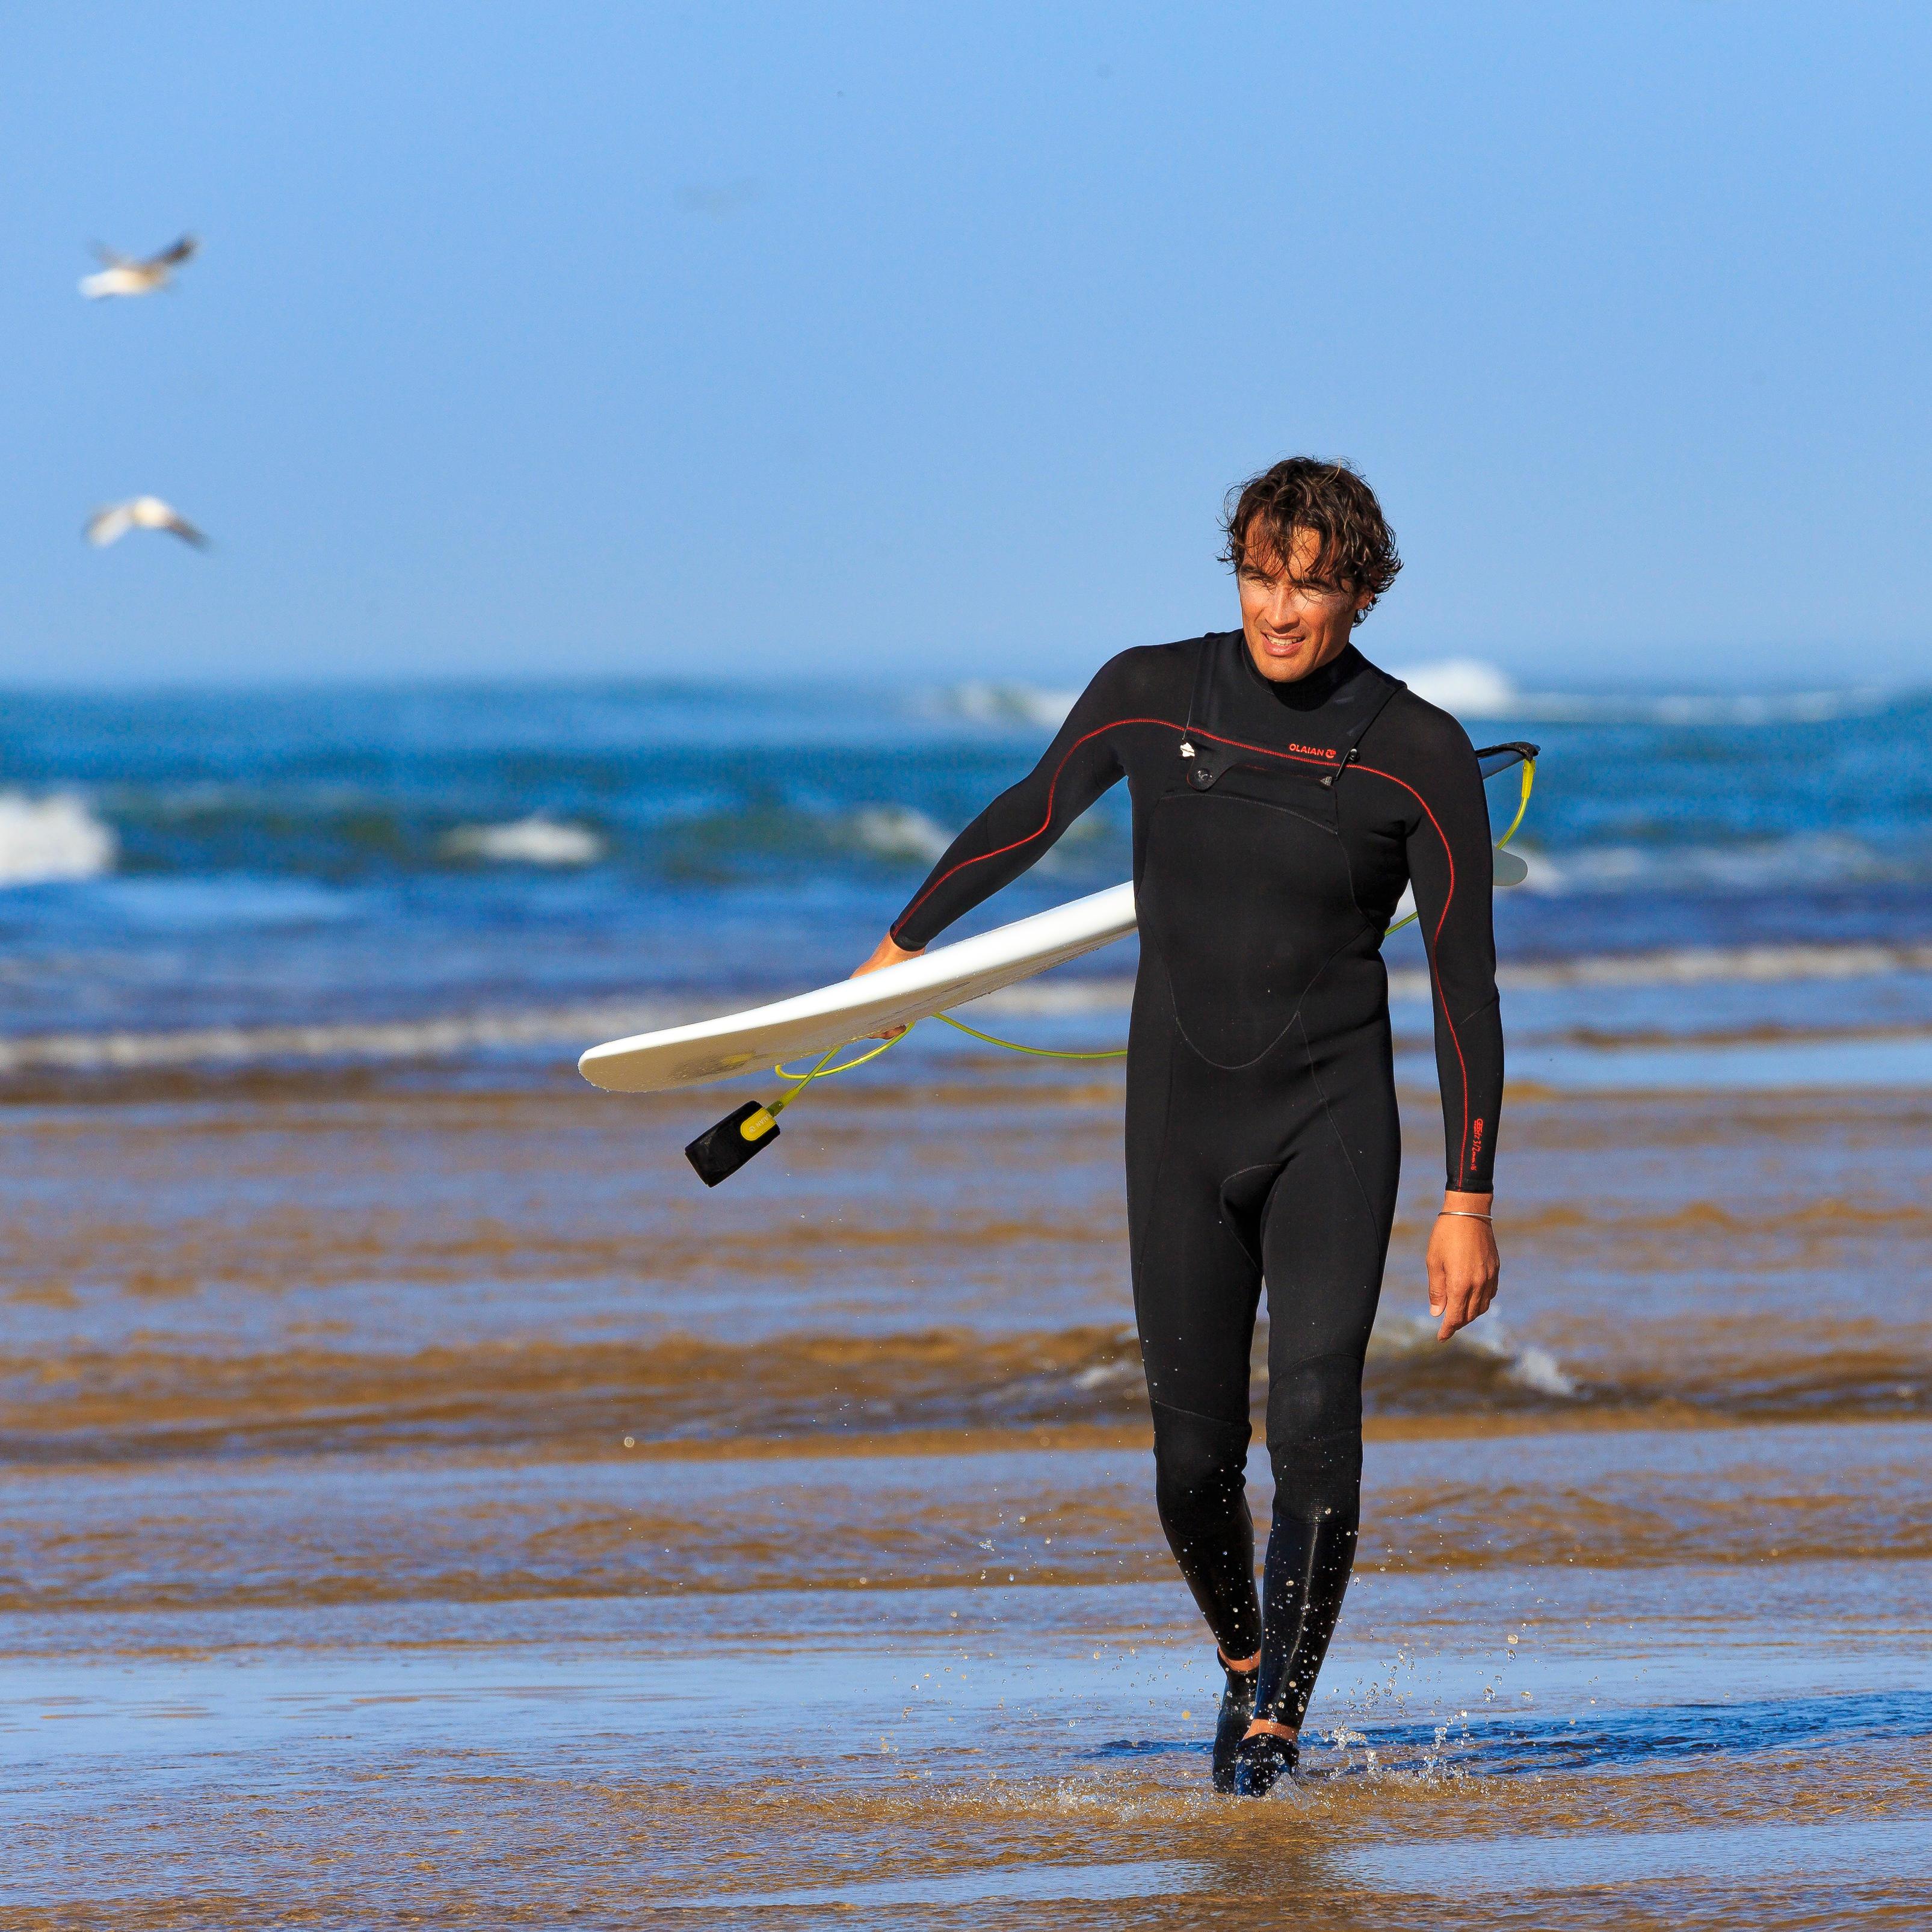 Surf Noir Néoprène 32 900 Mm Zip Poitrine Homme Combinaison TlFKJcu31